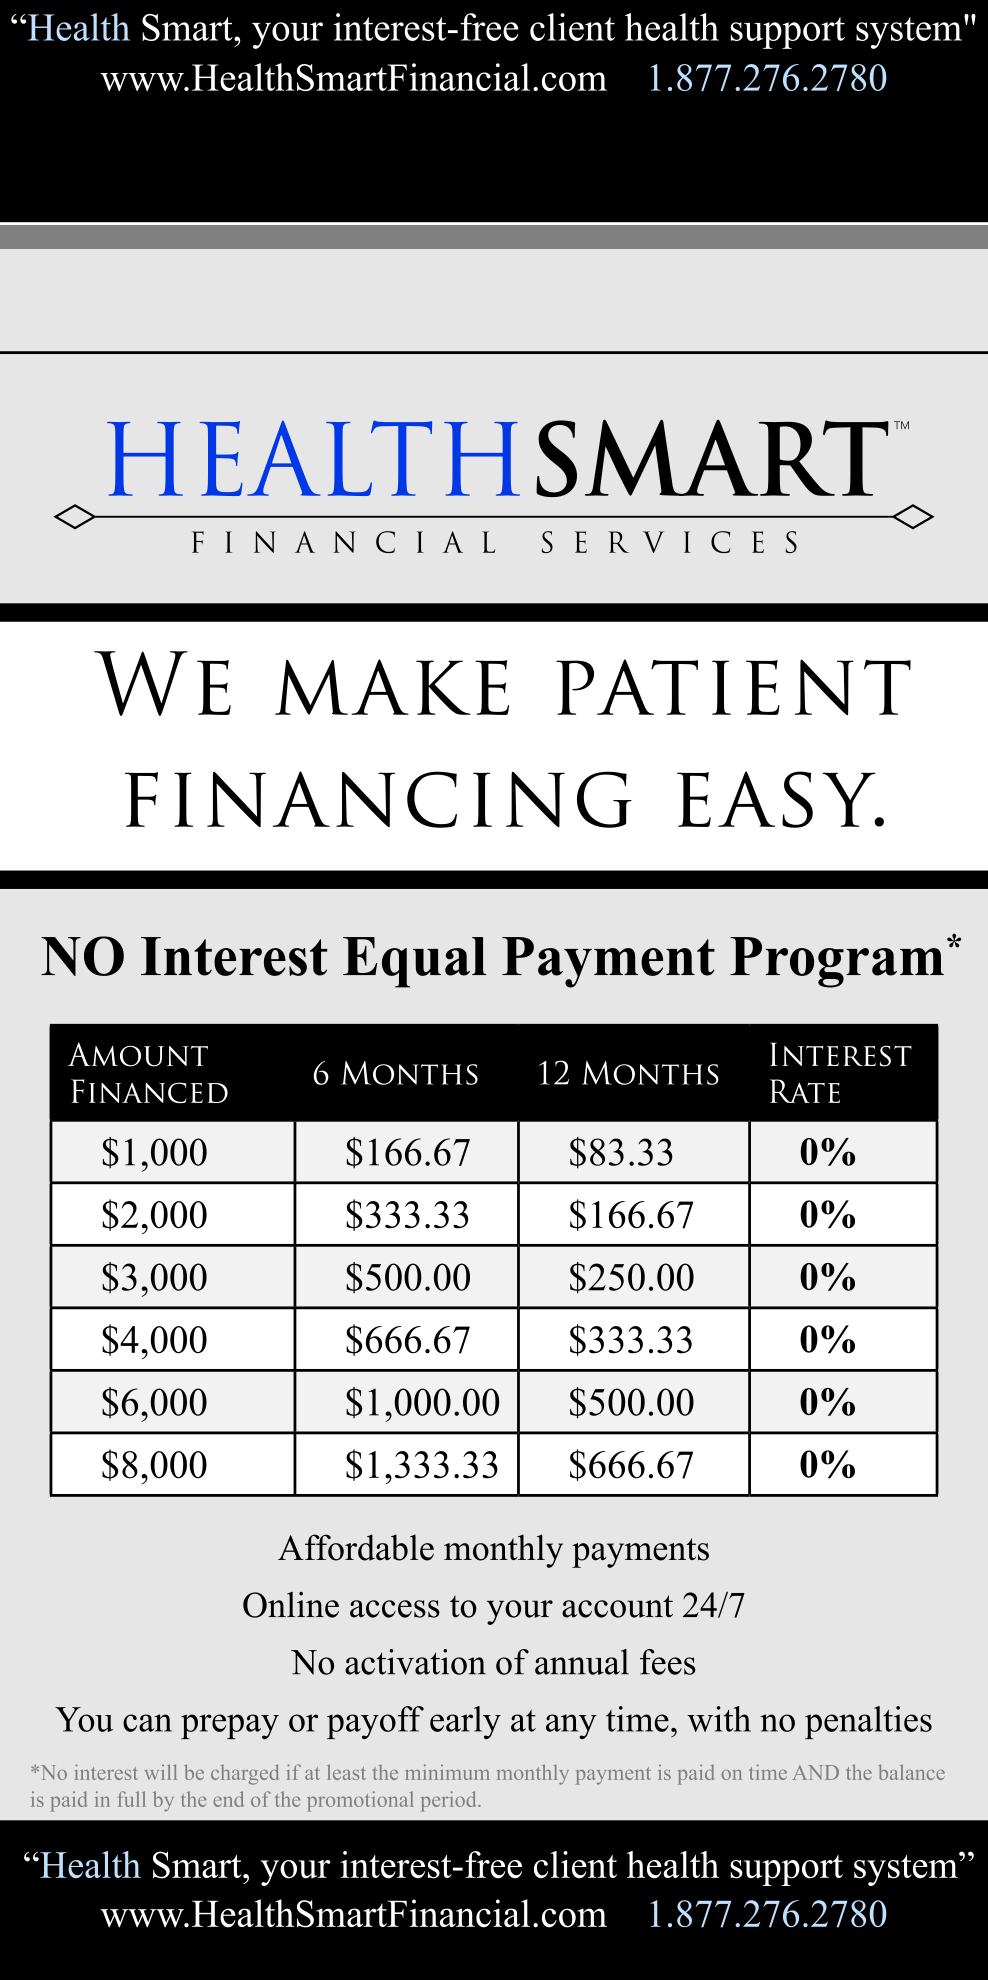 interest-free-financing-dentist-toronto3.png